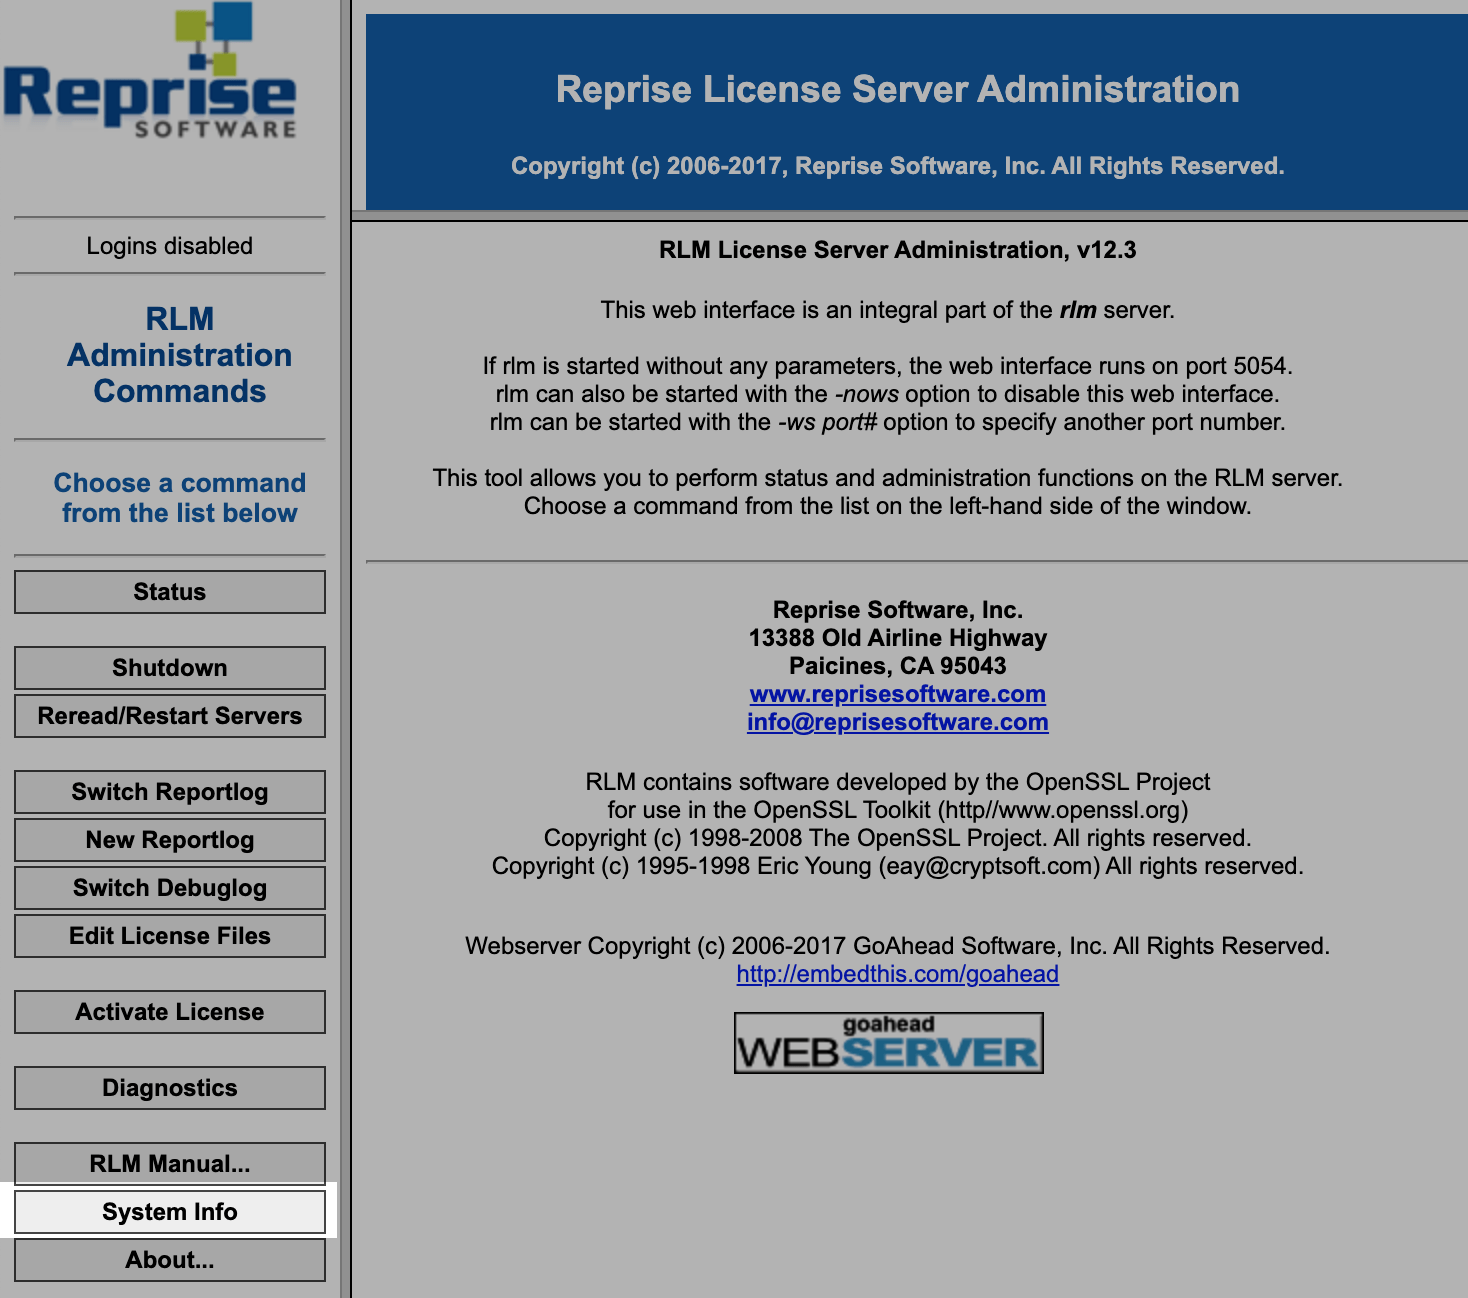 RLM Web System Info